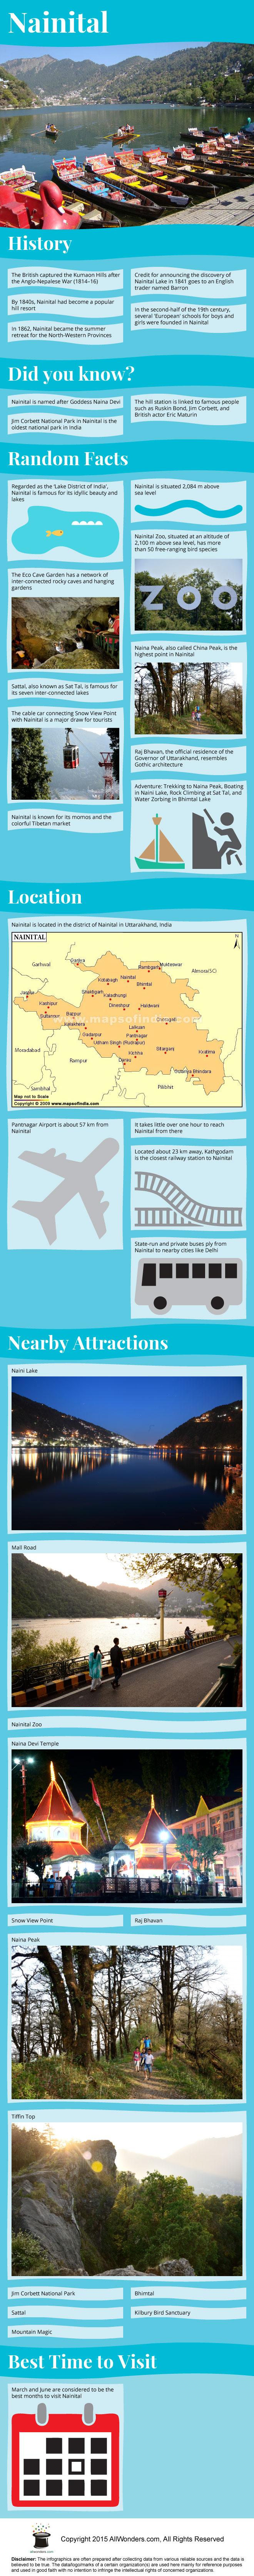 Nainital Infographic